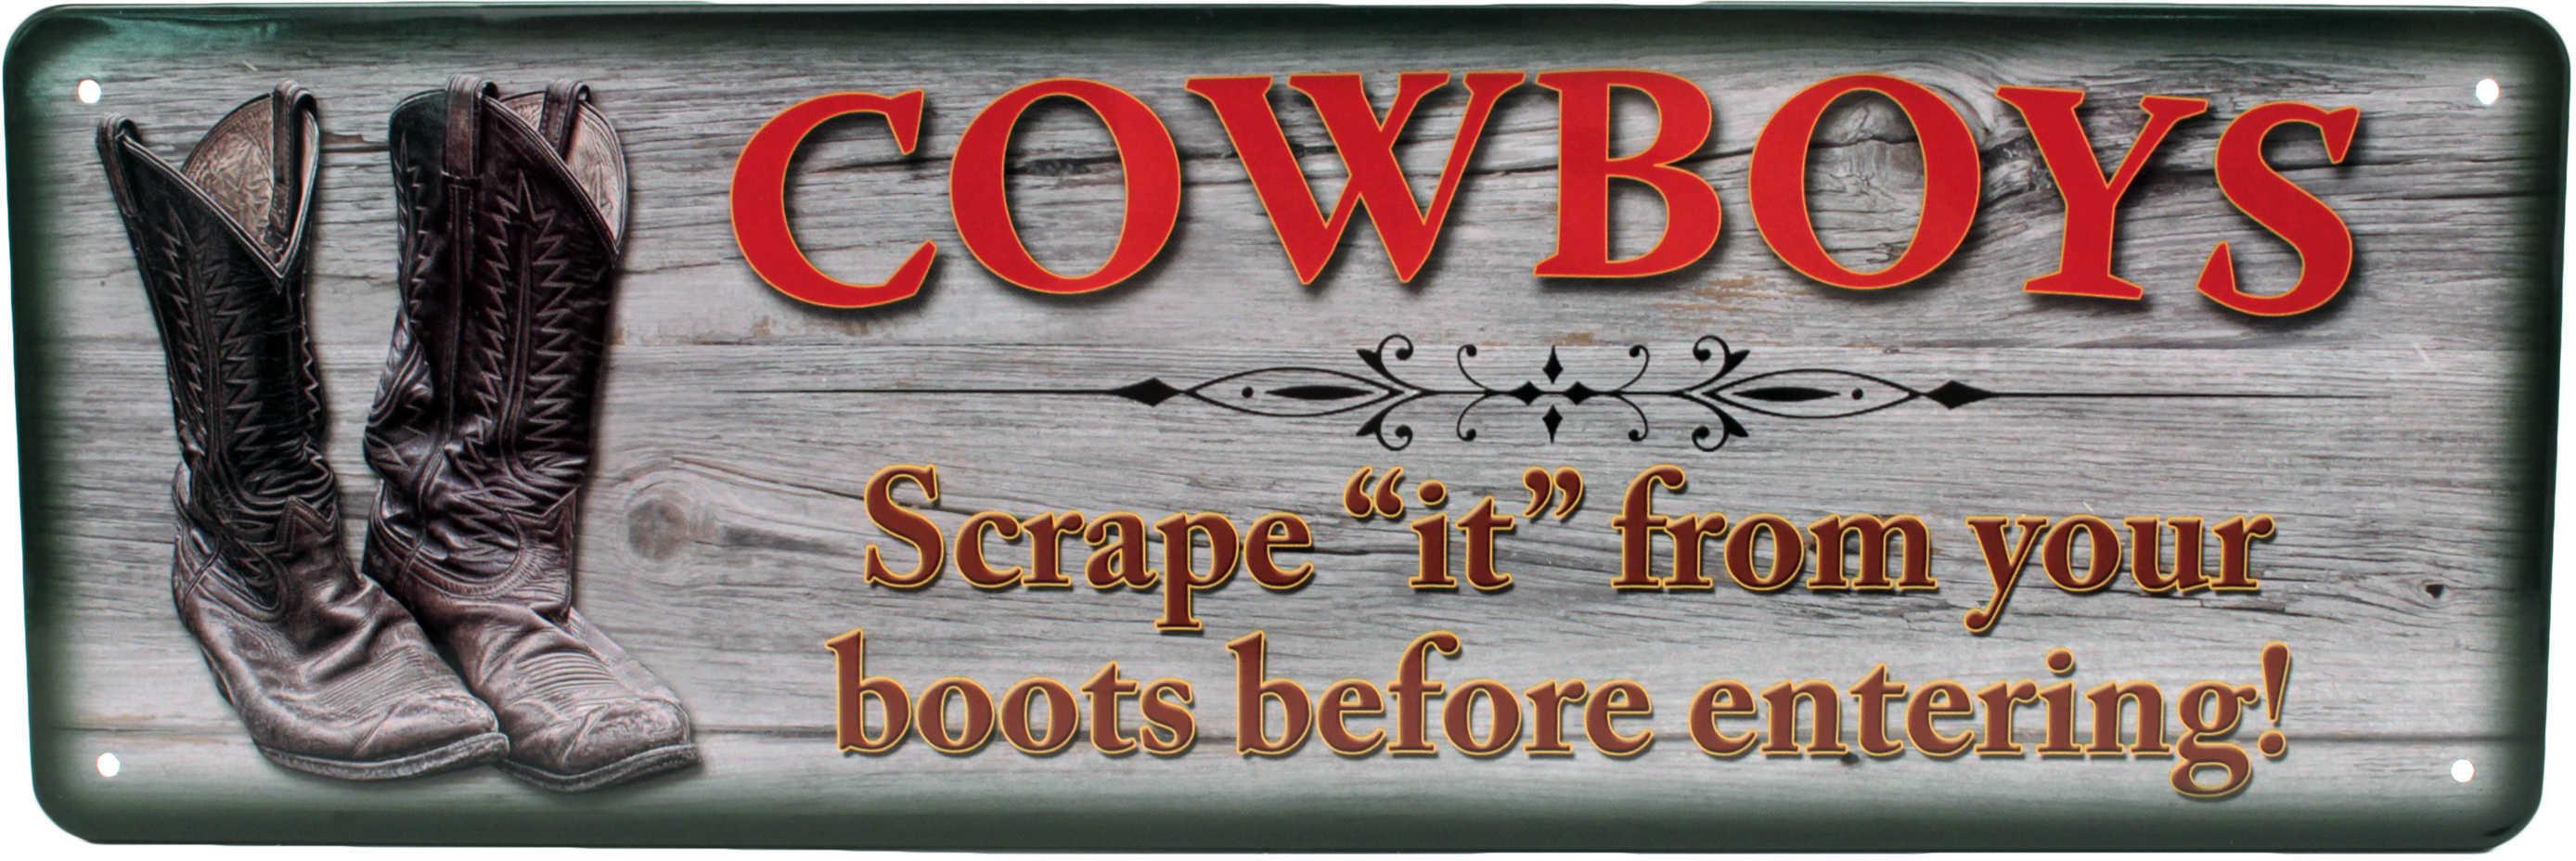 "Rivers Edge Products 10.5"" x 3.5"" Tin Sign Cowboys Scrape ""It"" 1402"